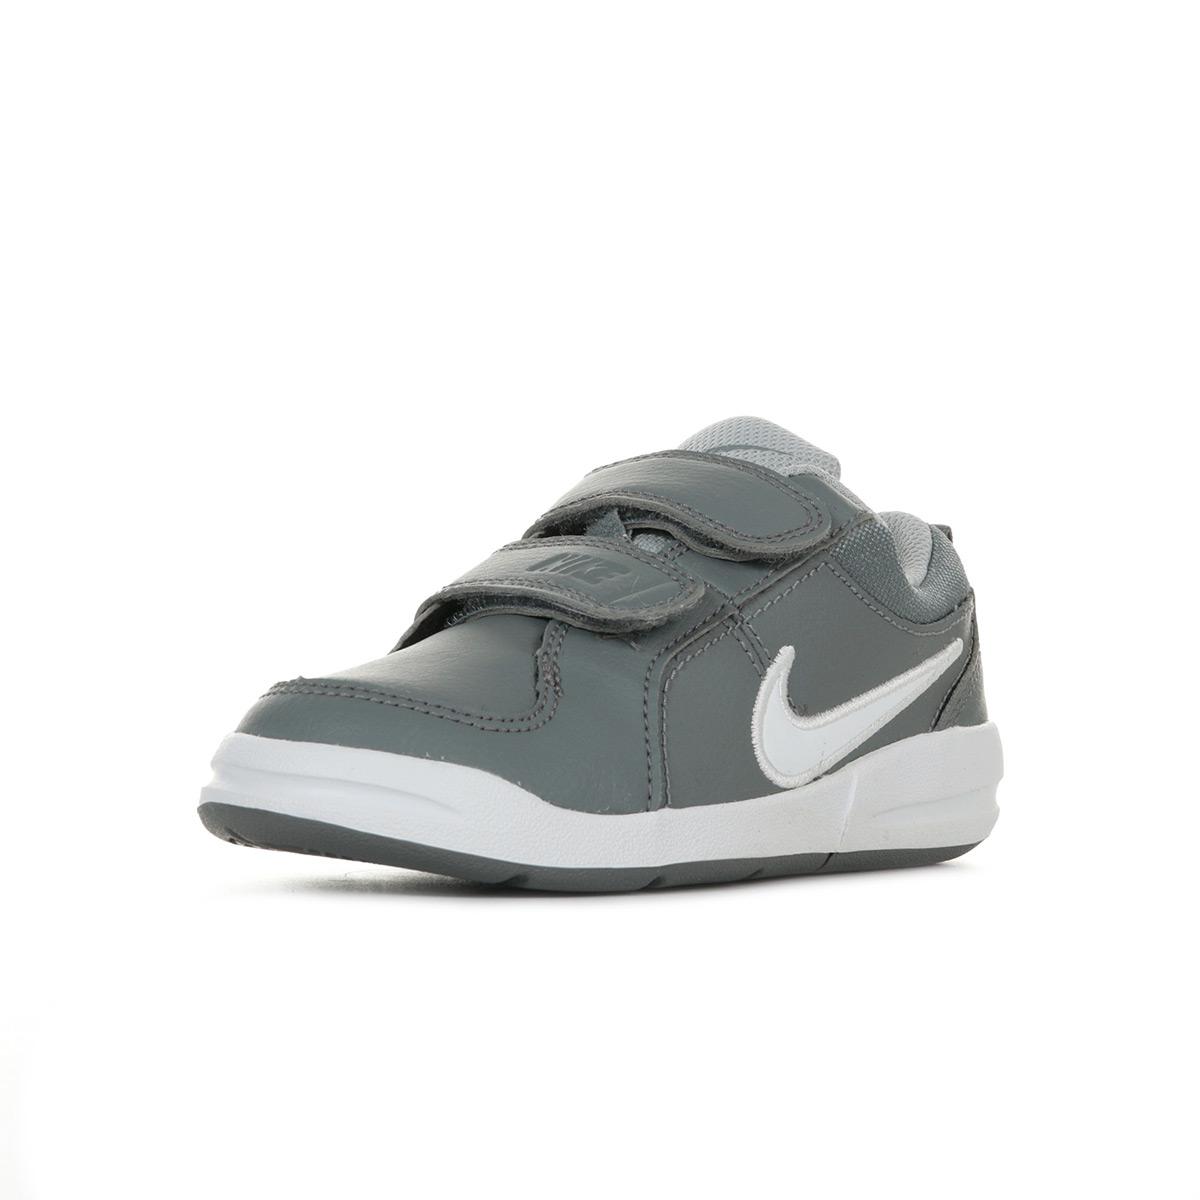 Pico Mode Pico Mode 4tdv454501022Baskets 4tdv454501022Baskets Nike Nike Nike ZPuXiOTwk